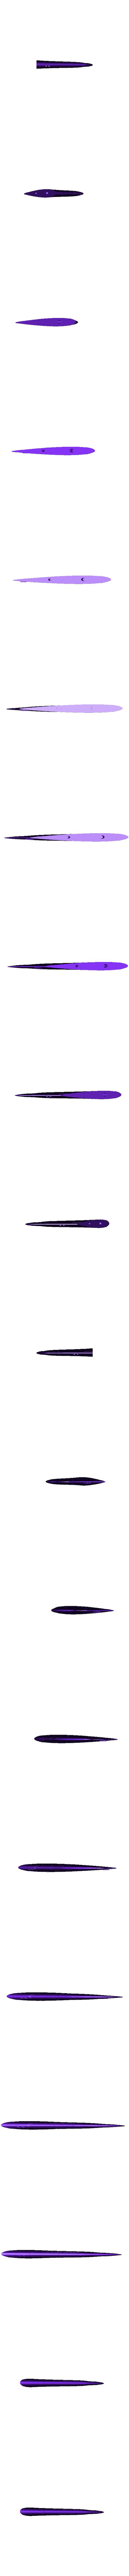 03-LH wing.stl Download STL file DOUGLAS F4D SKYRAY  • 3D printer object, 3DprintedArmy